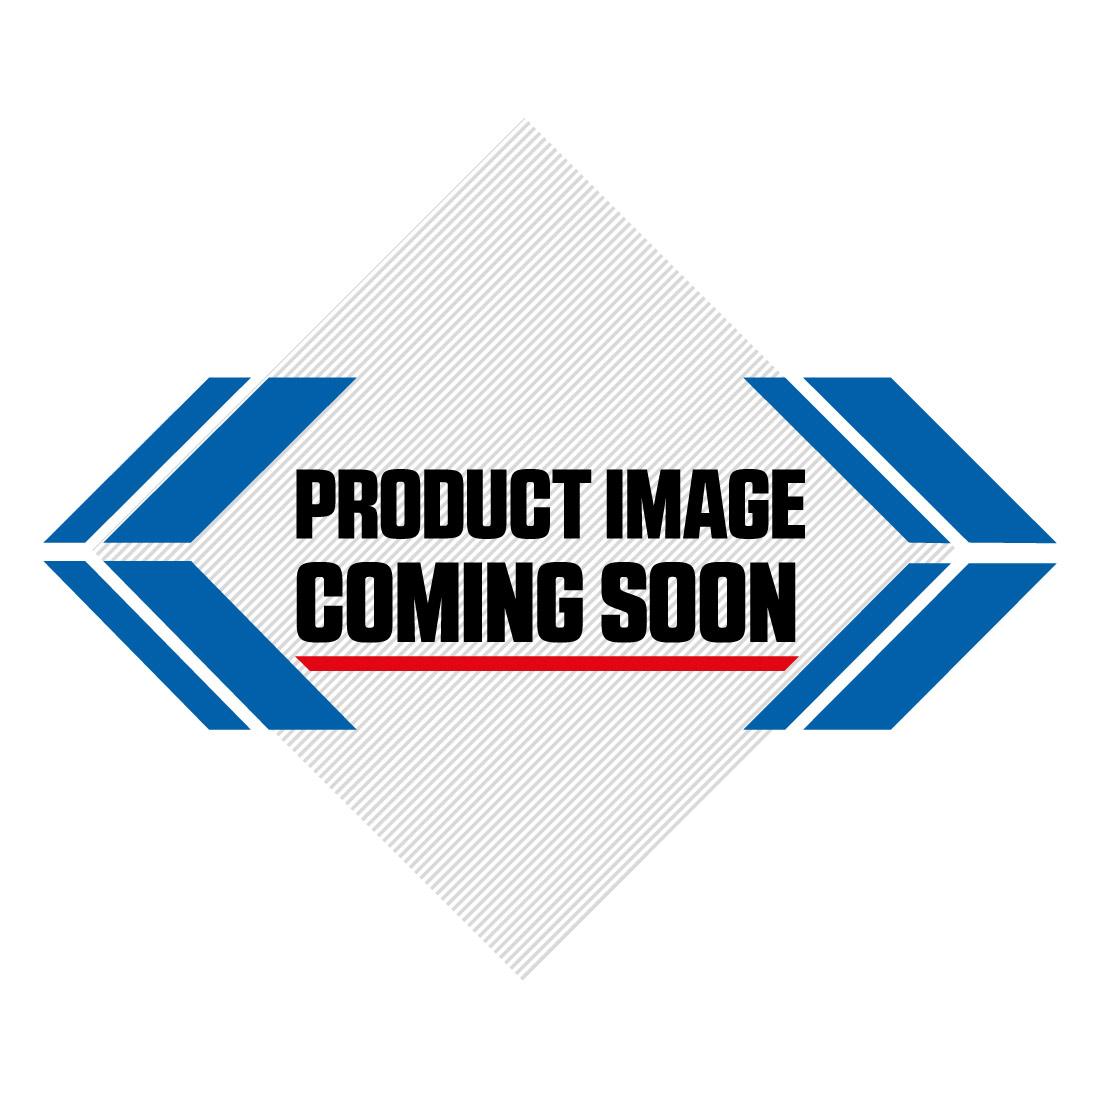 Suzuki Plastic Kit RMZ 450 (08-17) Black Image-4>